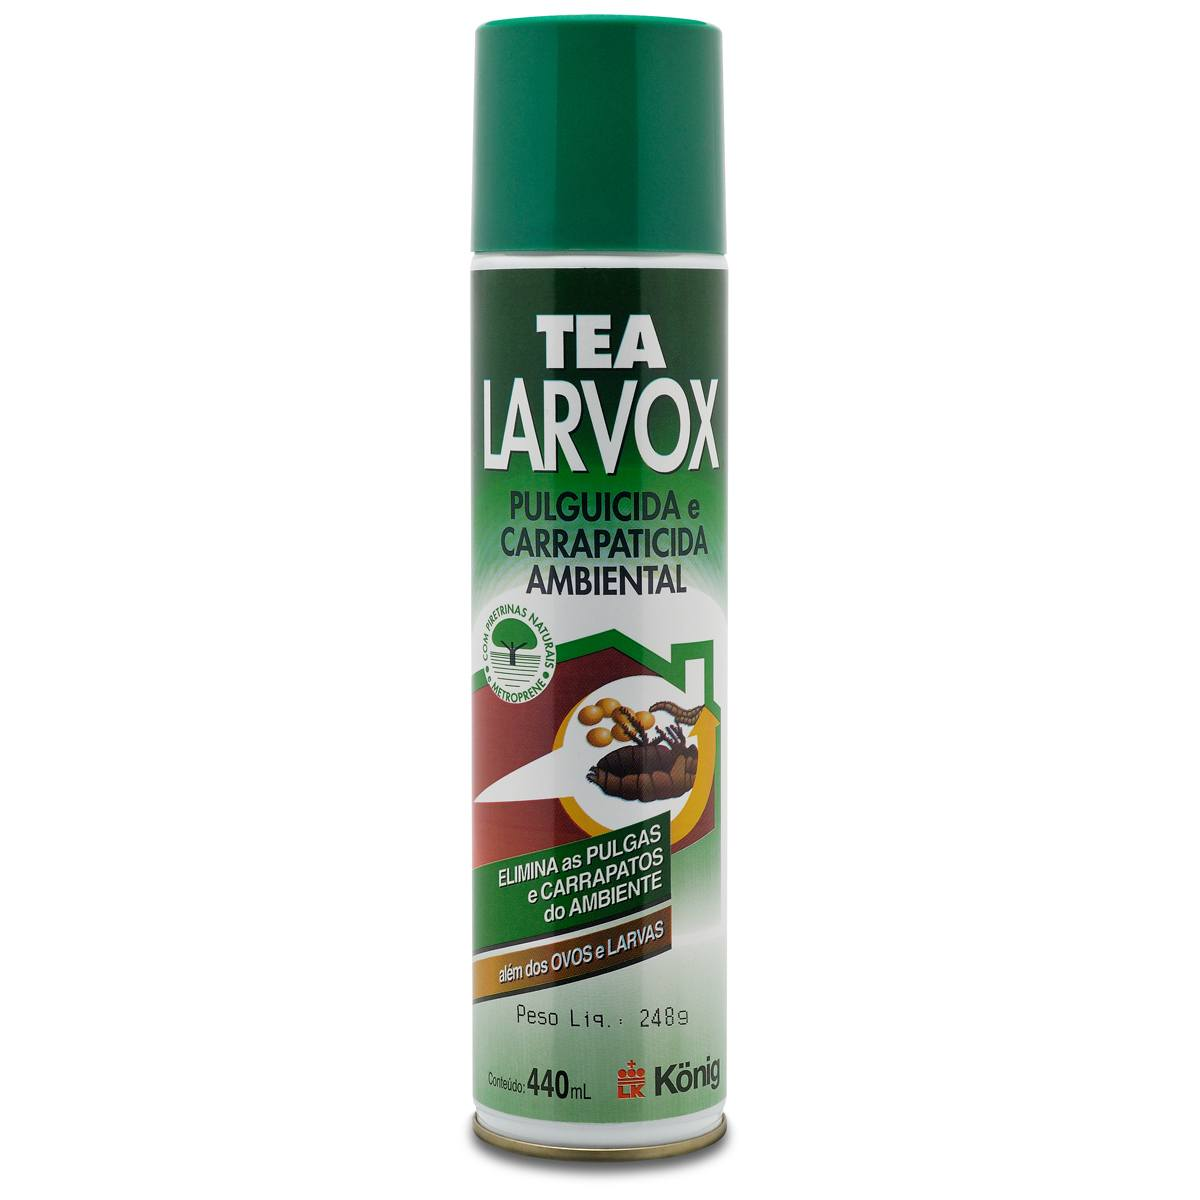 Pulguicida Carrapaticida Aerosol Tea Larvox Konig 440 ml